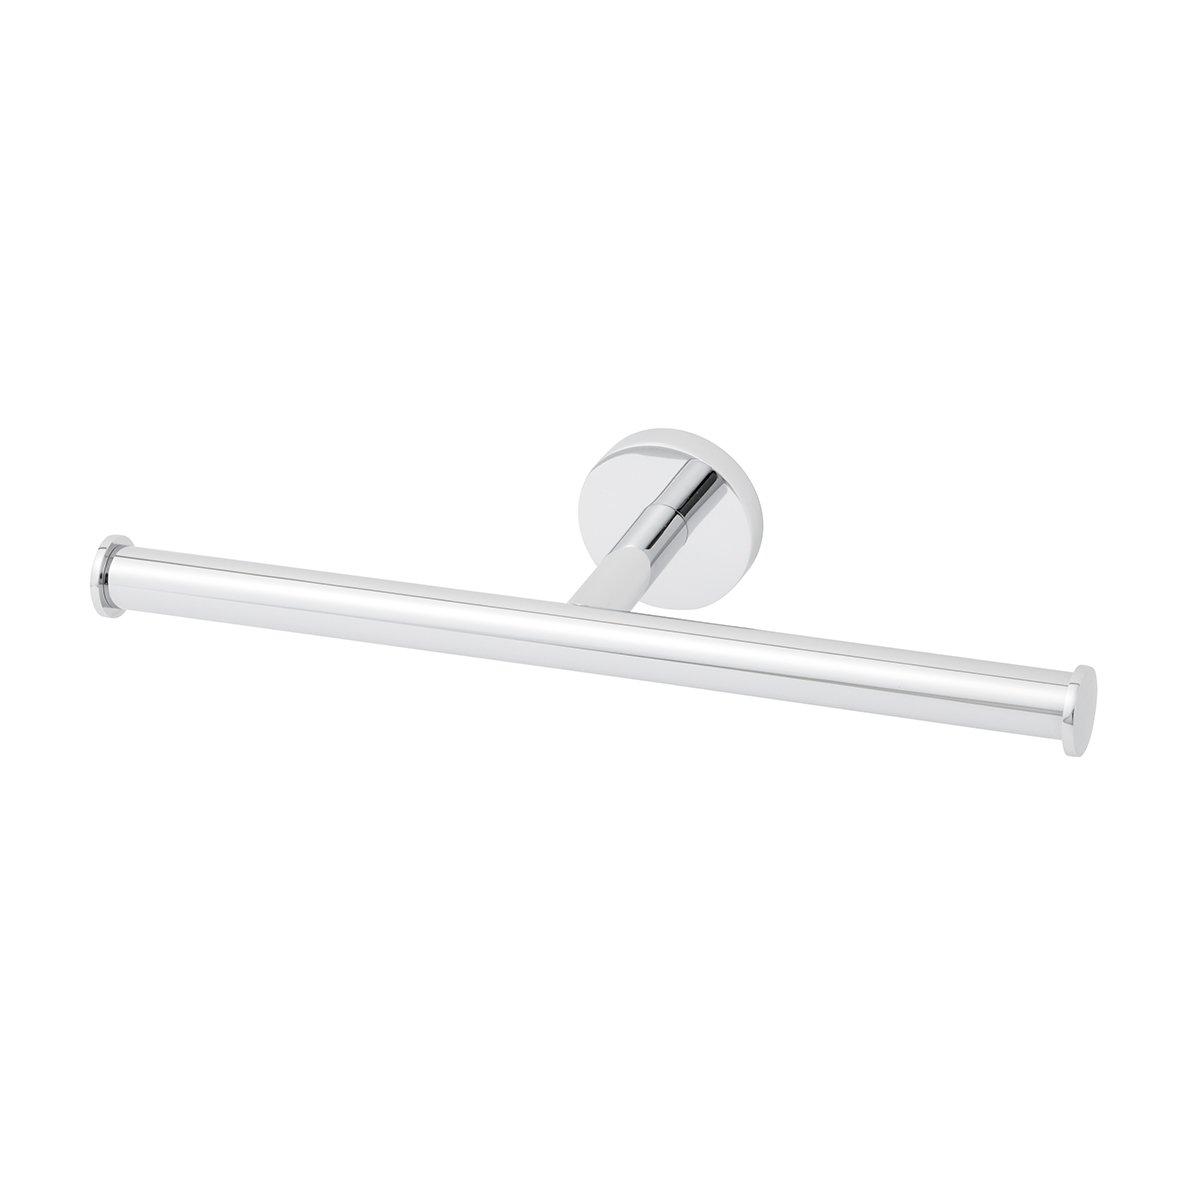 Speakman, Polished Chrome SA-2010 Neo Double Toilet Paper Holder